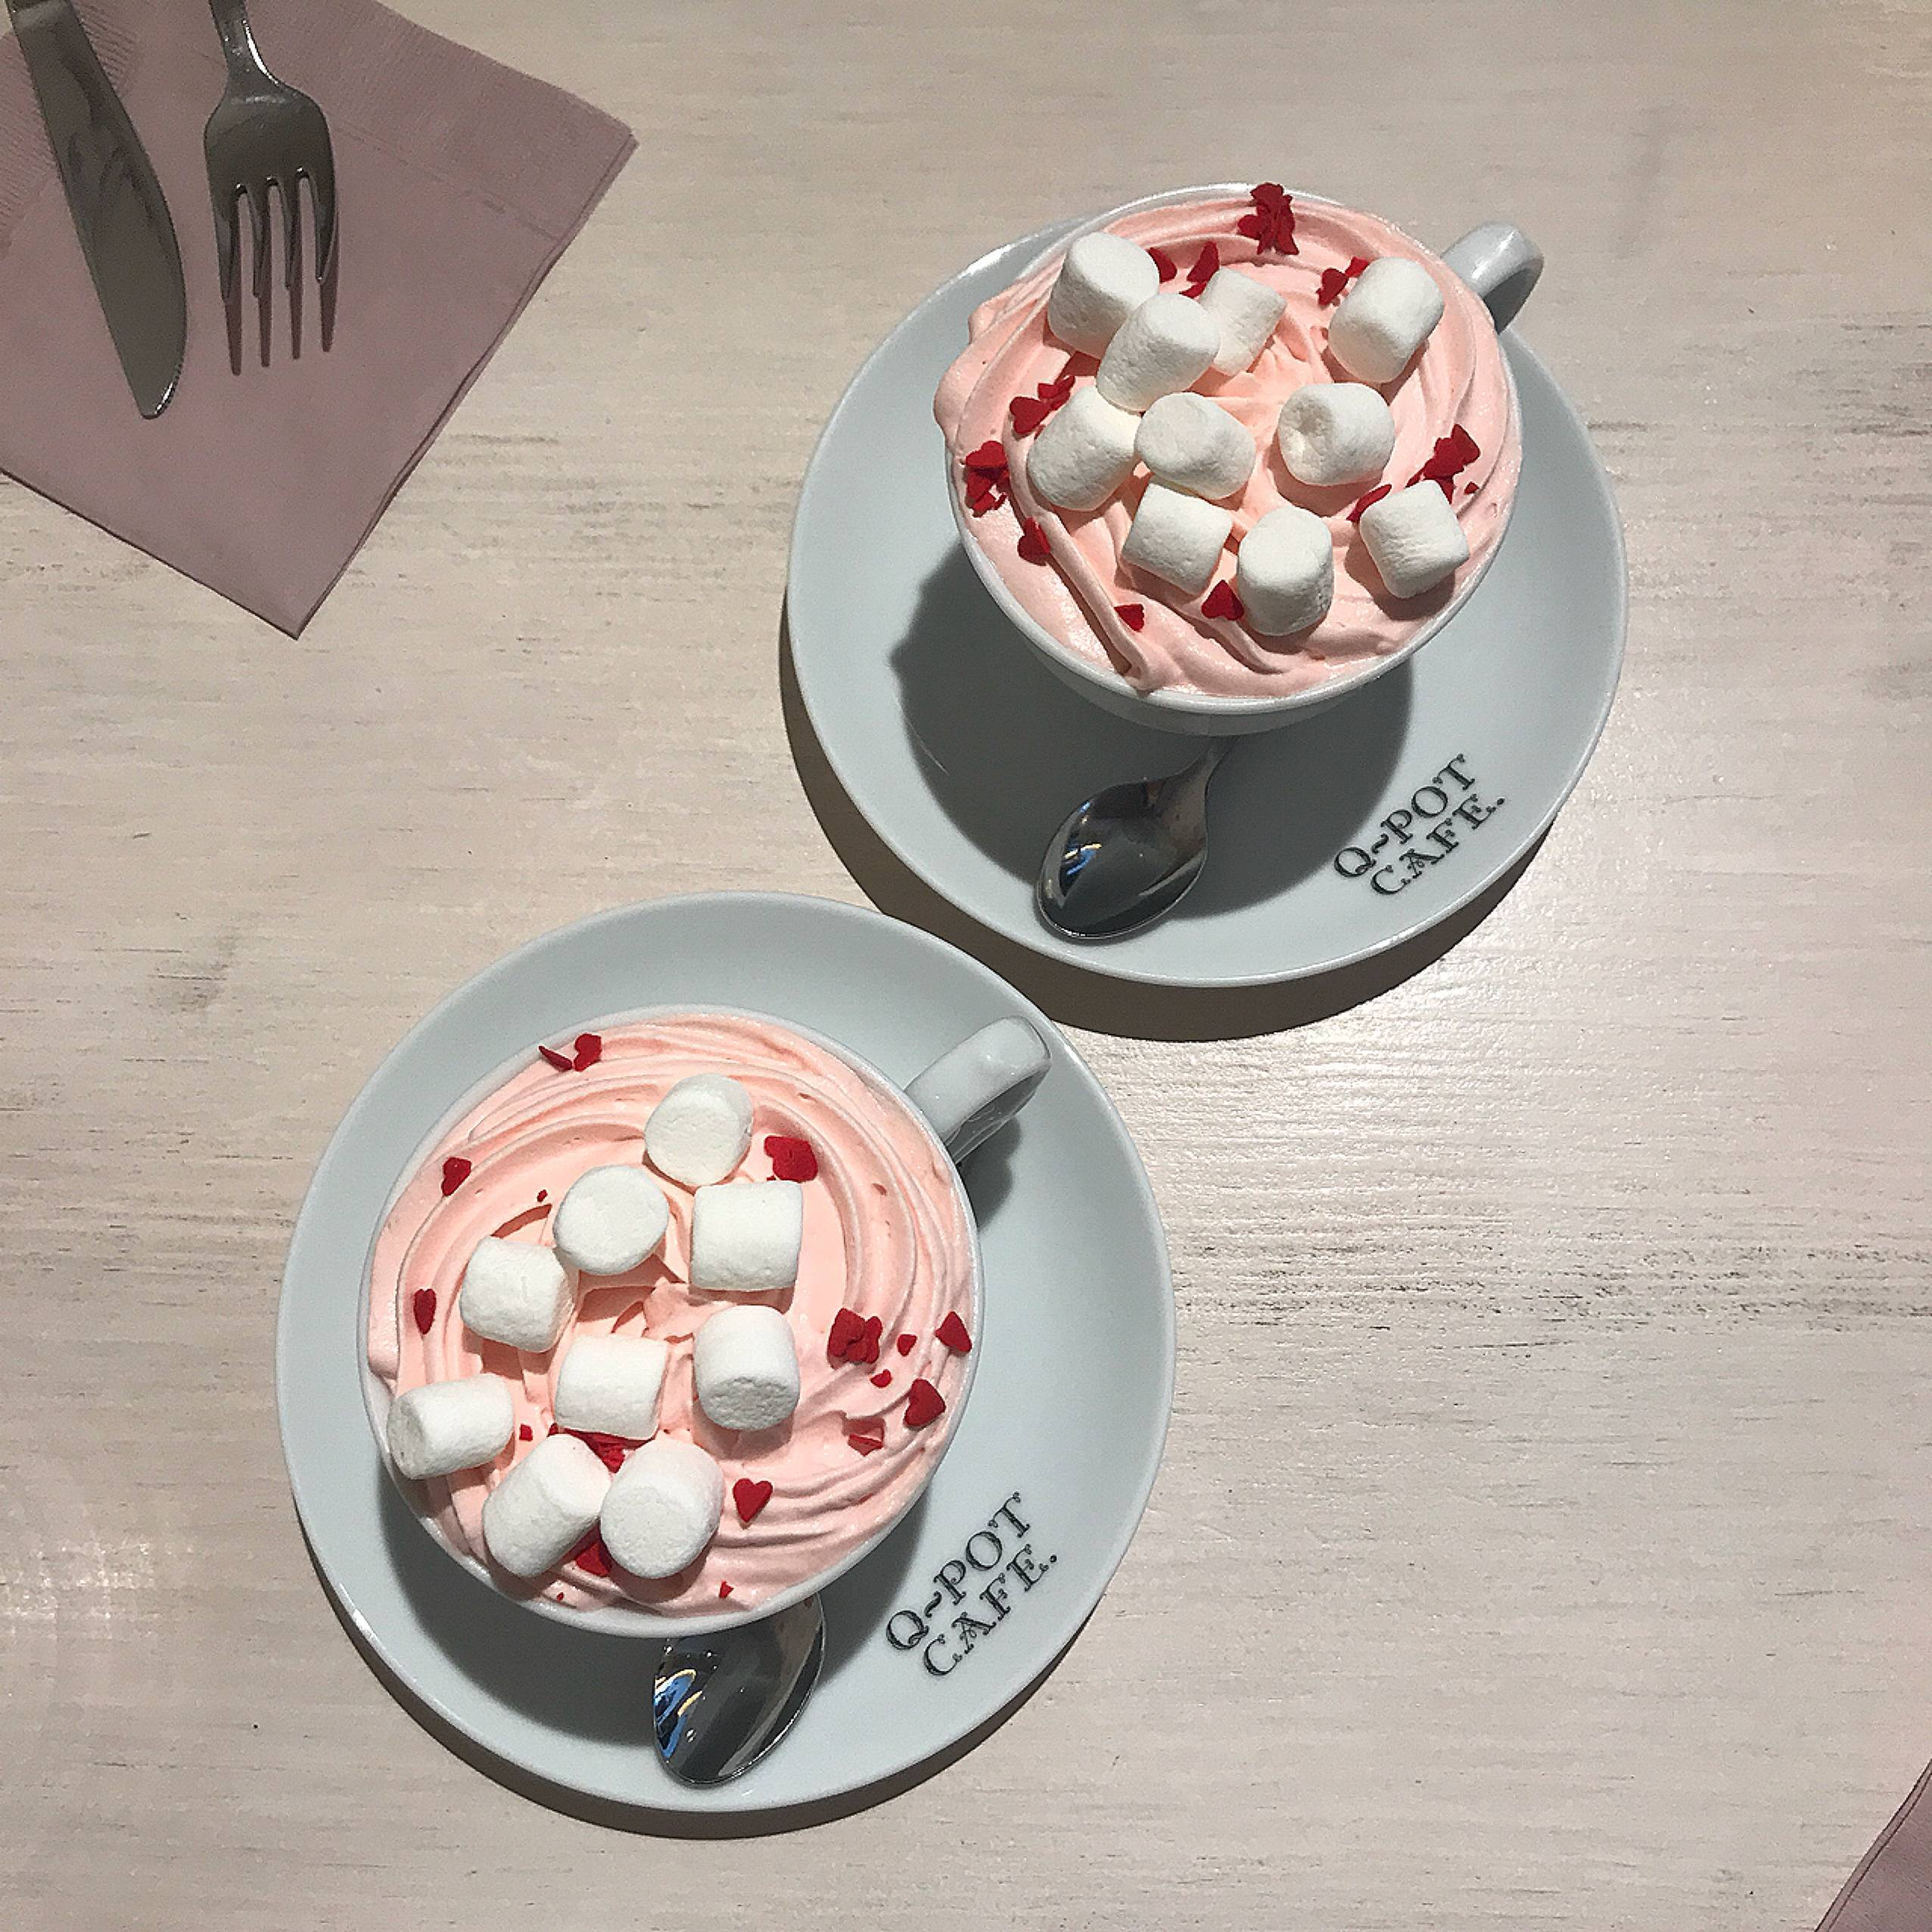 Vol.37♡ 可愛すぎる!Q-pot CAFE.のバレンタイン限定メニュー❤︎_1_4-1